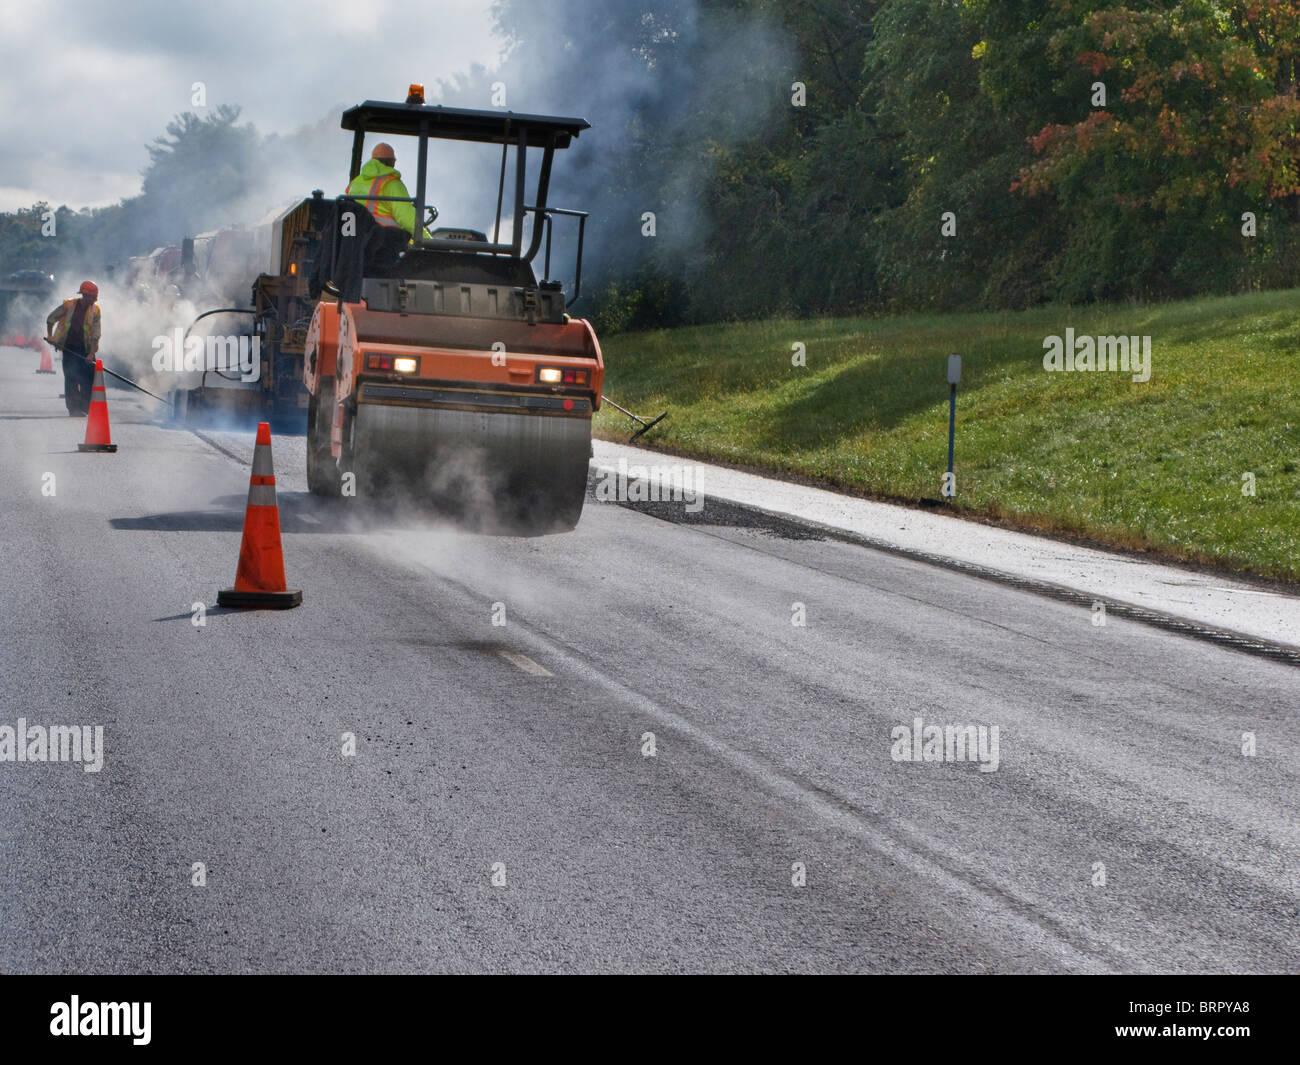 men at work with asphalt paving equipment - Stock Image